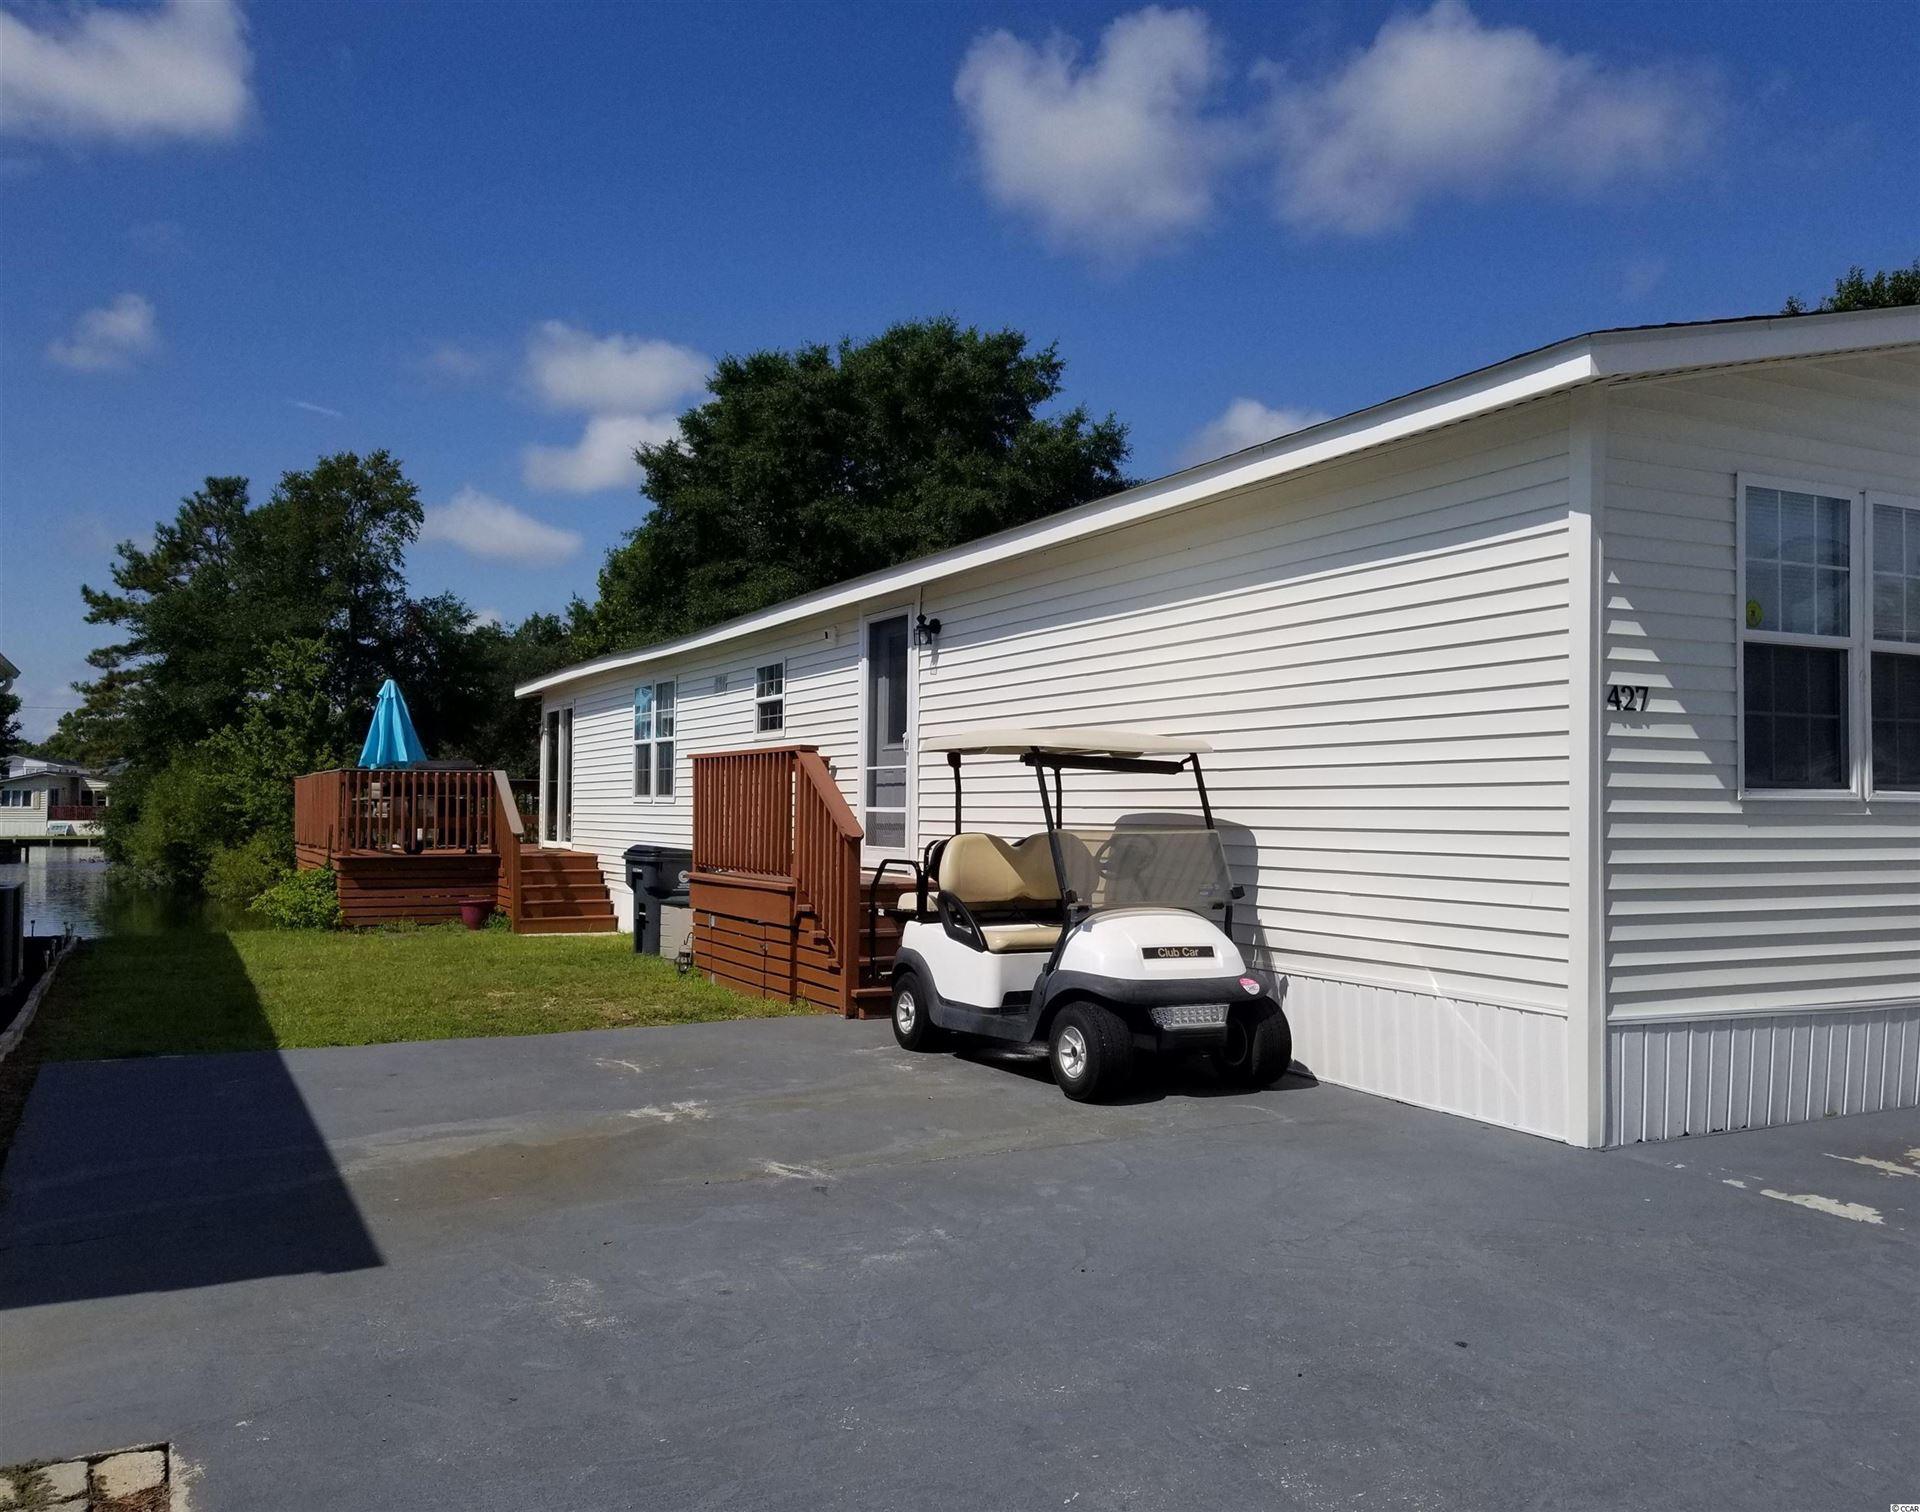 427 Meadowlark Dr., Surfside Beach, SC 29575 - MLS#: 2116184